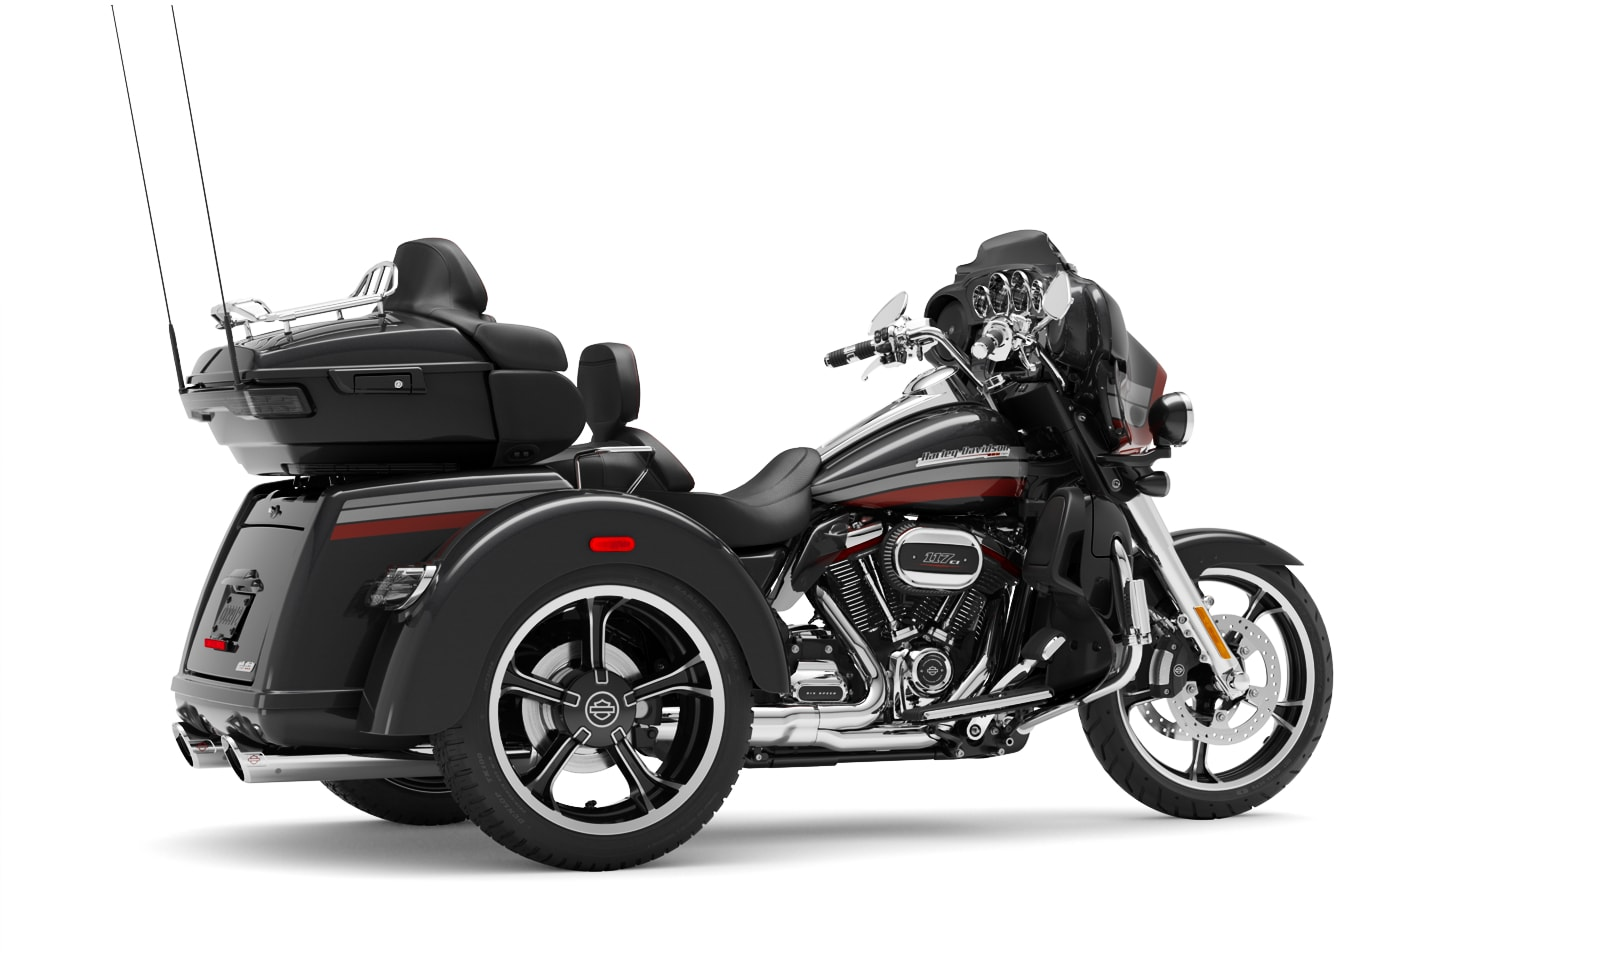 2020 Harley-Davidson CVO Tri Glide US Market Price ...